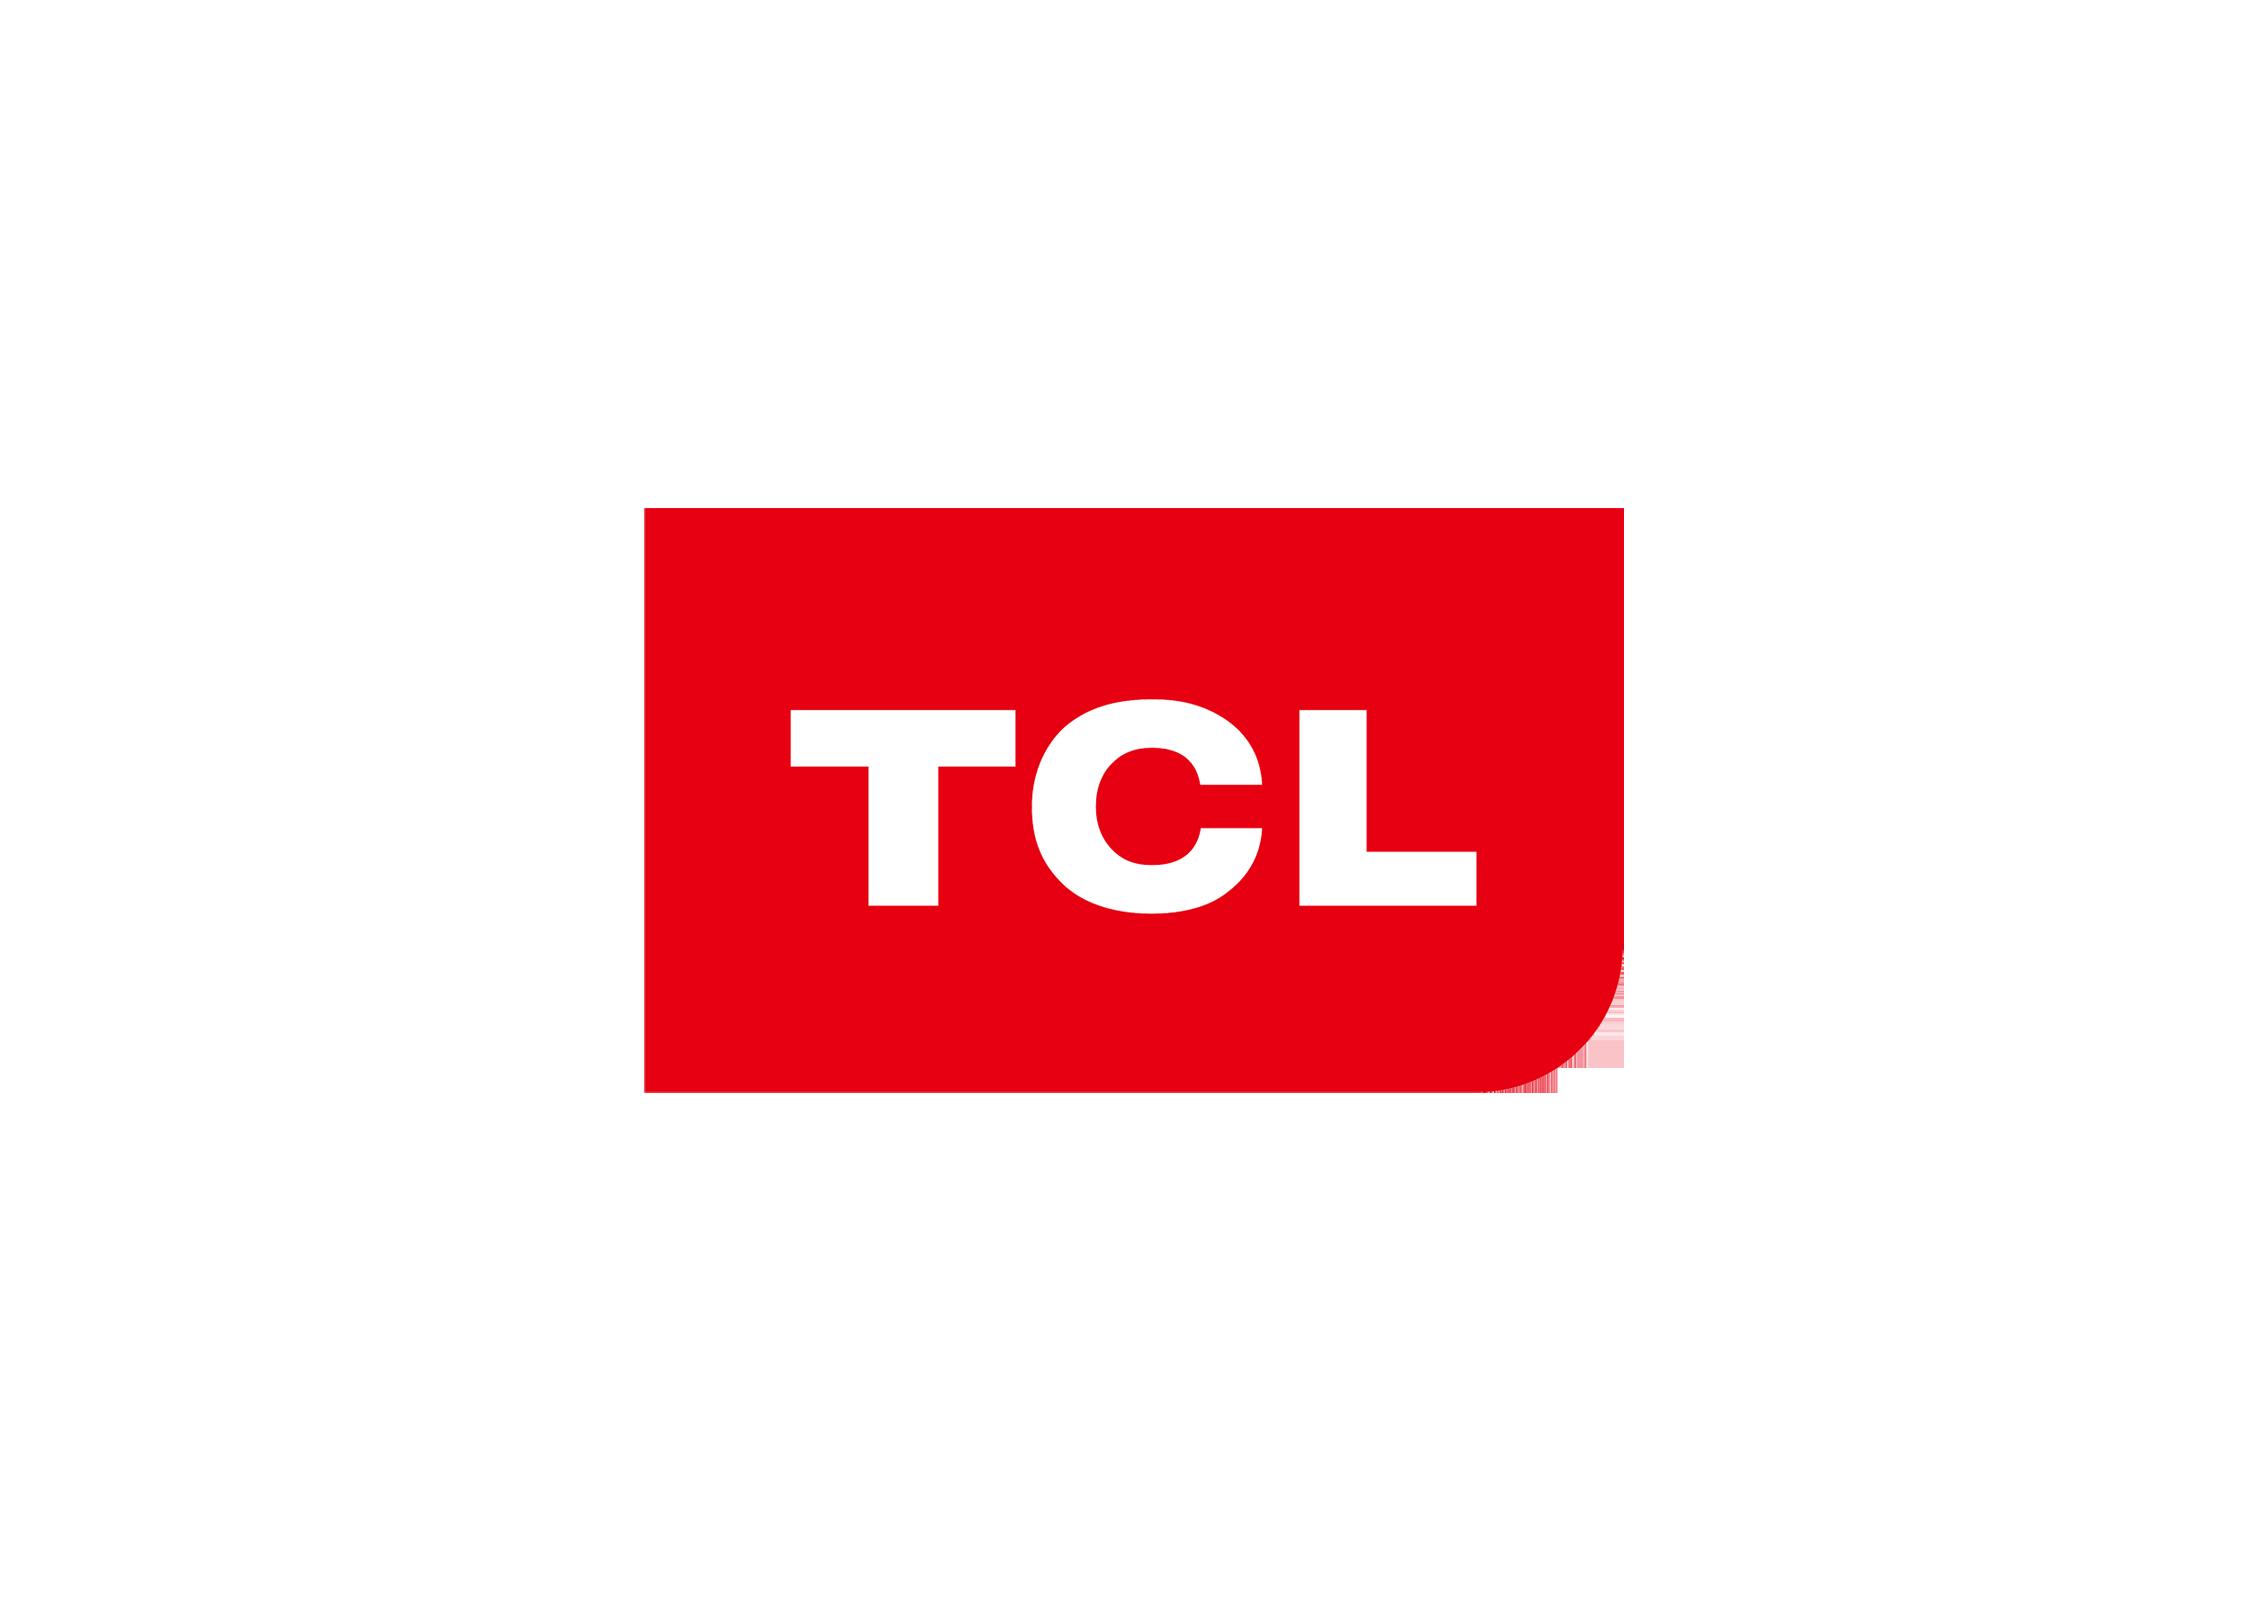 【 TCL Service Centre in Karimnagar Andhra Pradesh 】Free Service